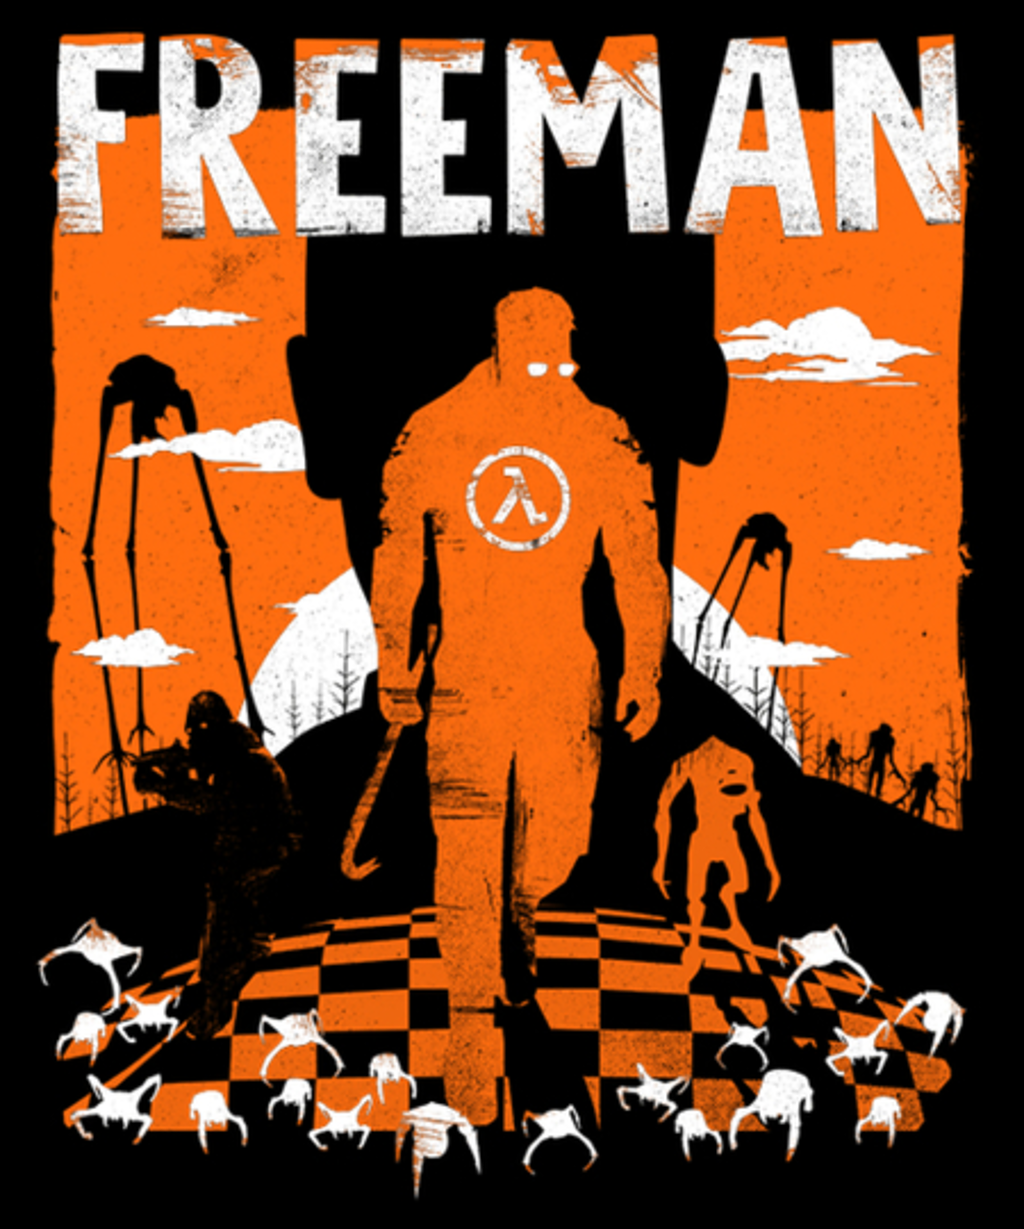 Qwertee: The Freeman